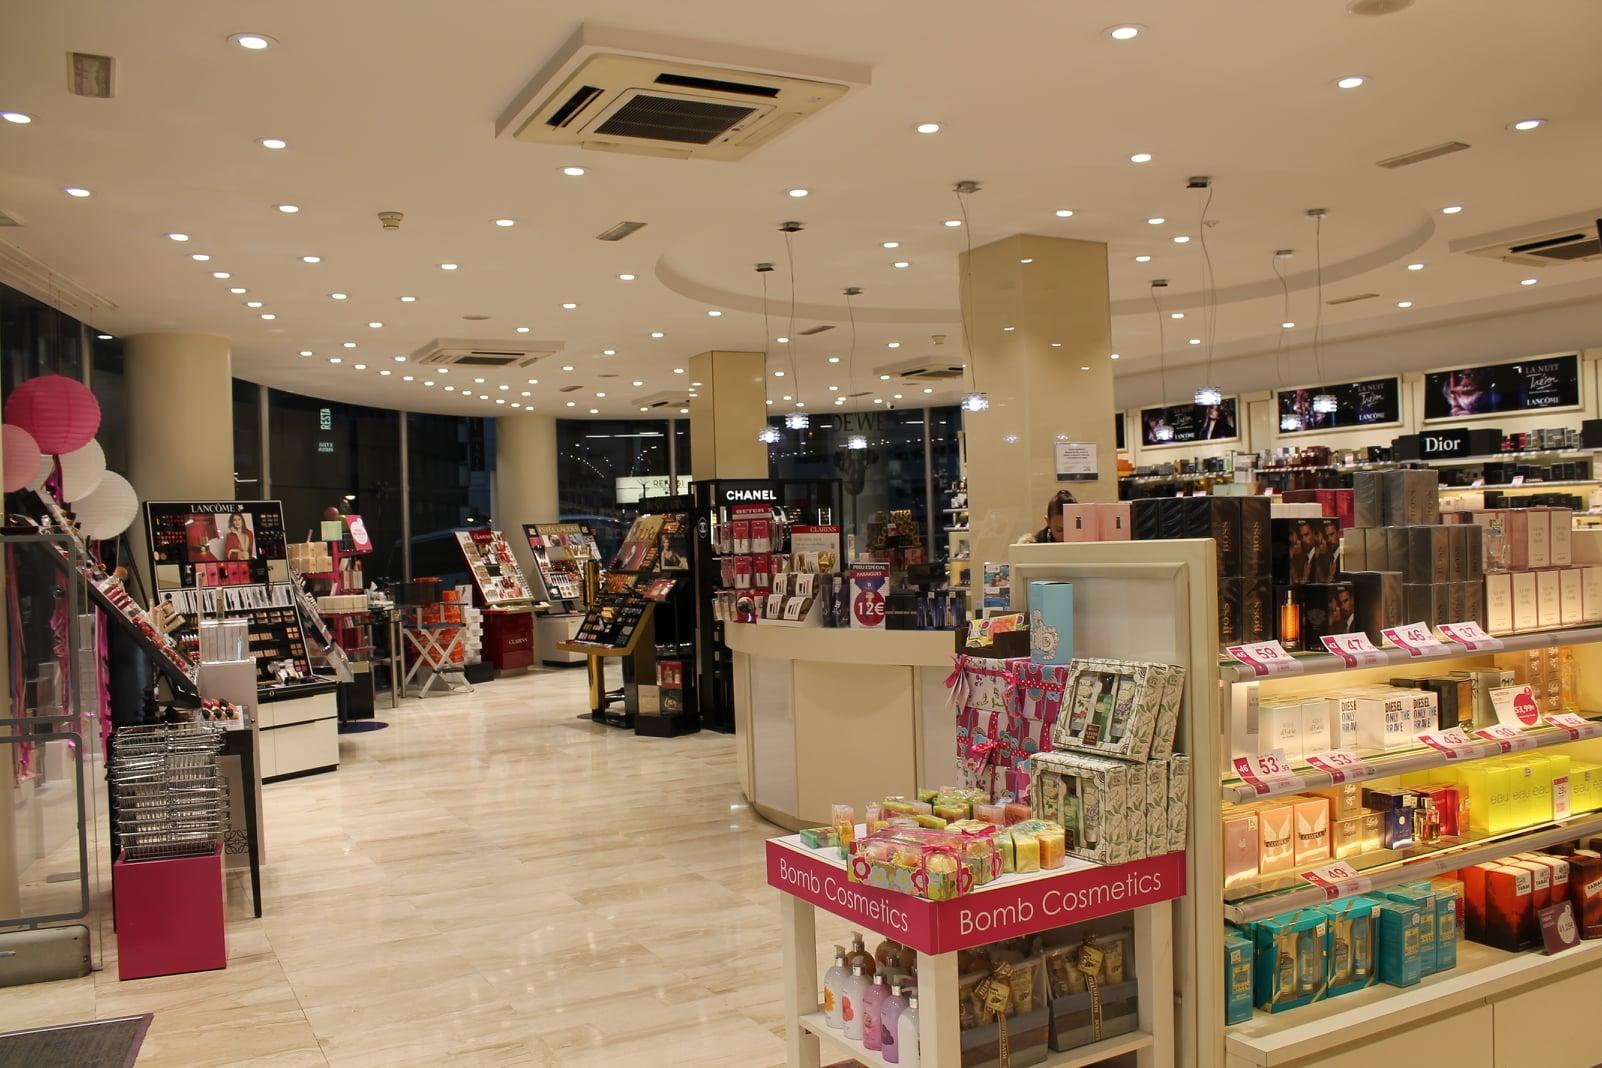 perfumerias-gala-andorra-perfumes-maquillaje